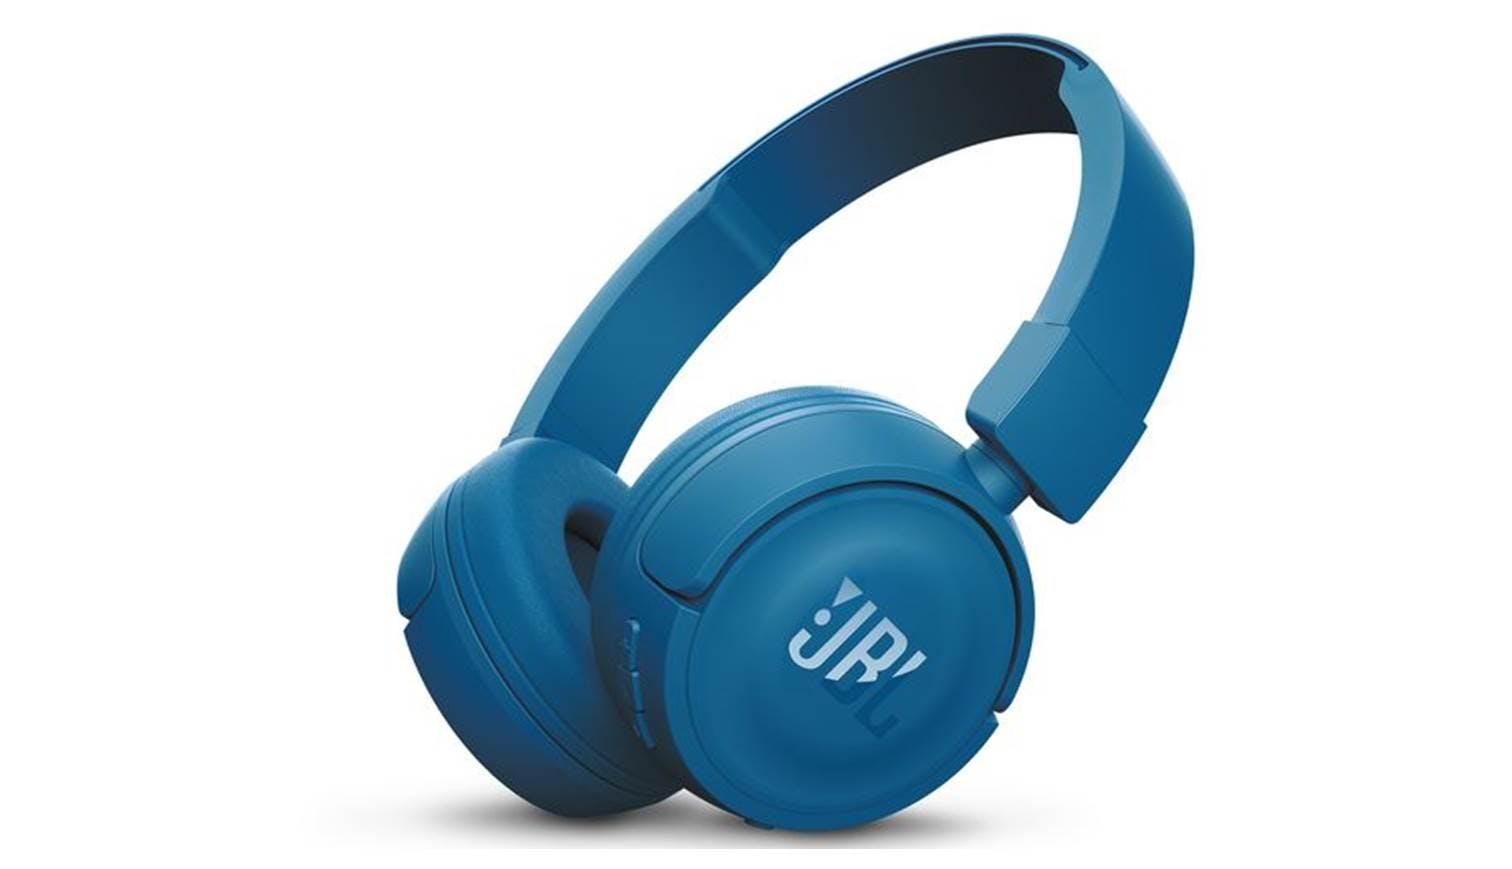 jbl t450 bluetooth on ear headphones blue harvey norman singapore. Black Bedroom Furniture Sets. Home Design Ideas